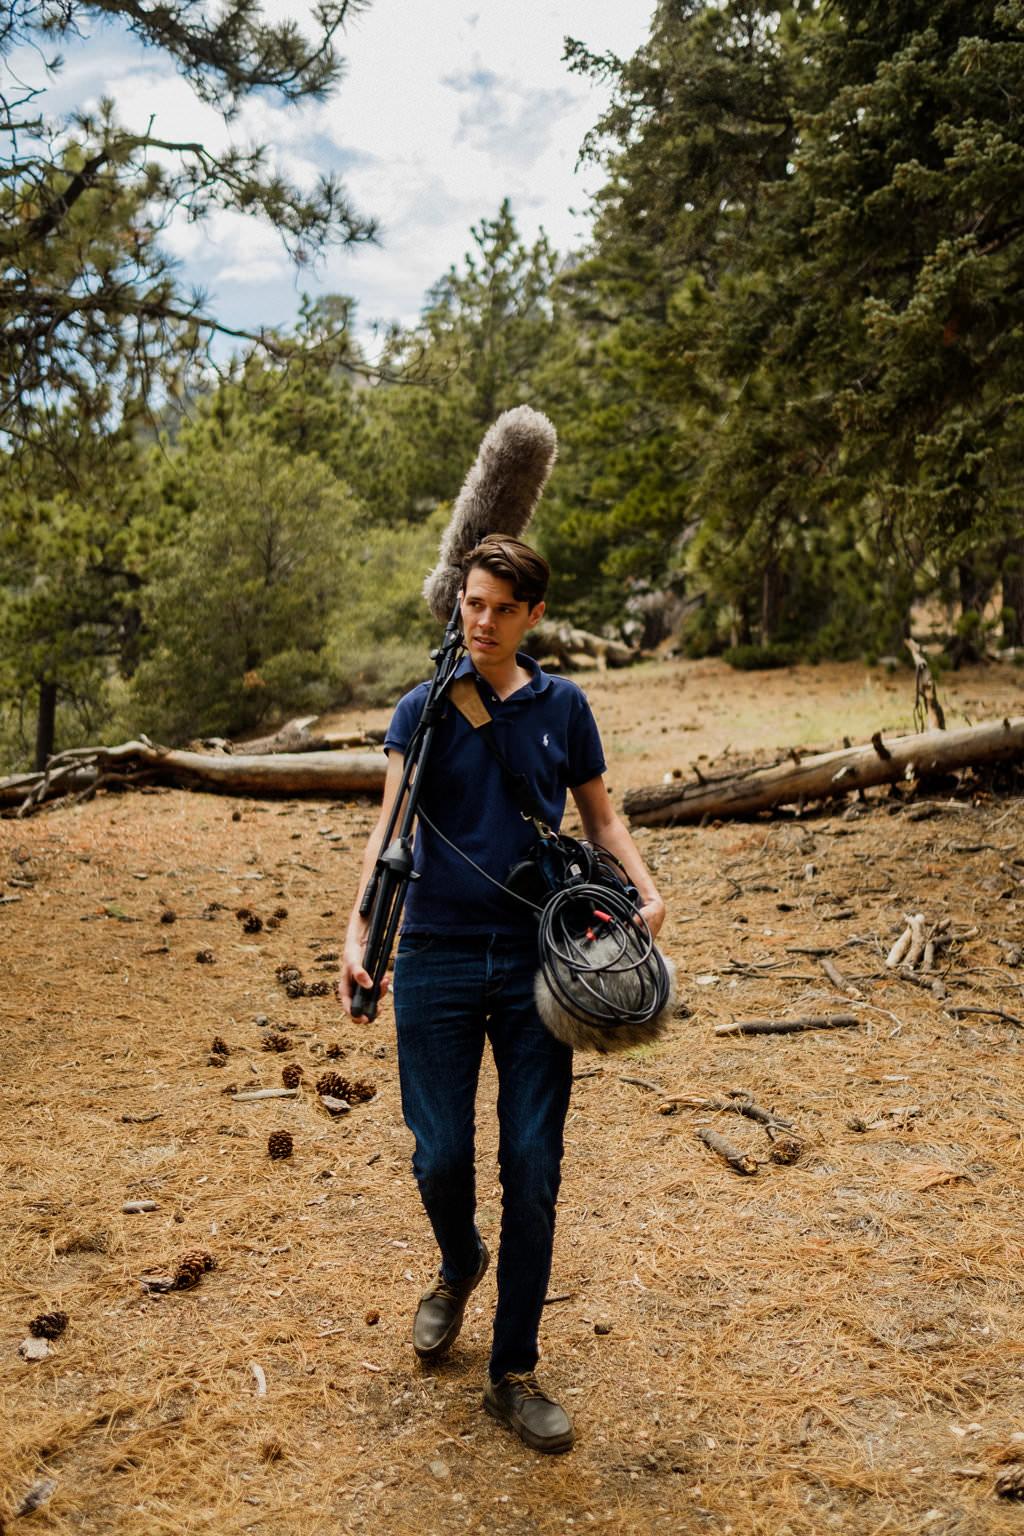 1-field-sound-recording-los-angeles-freelance-photographer-023.JPG